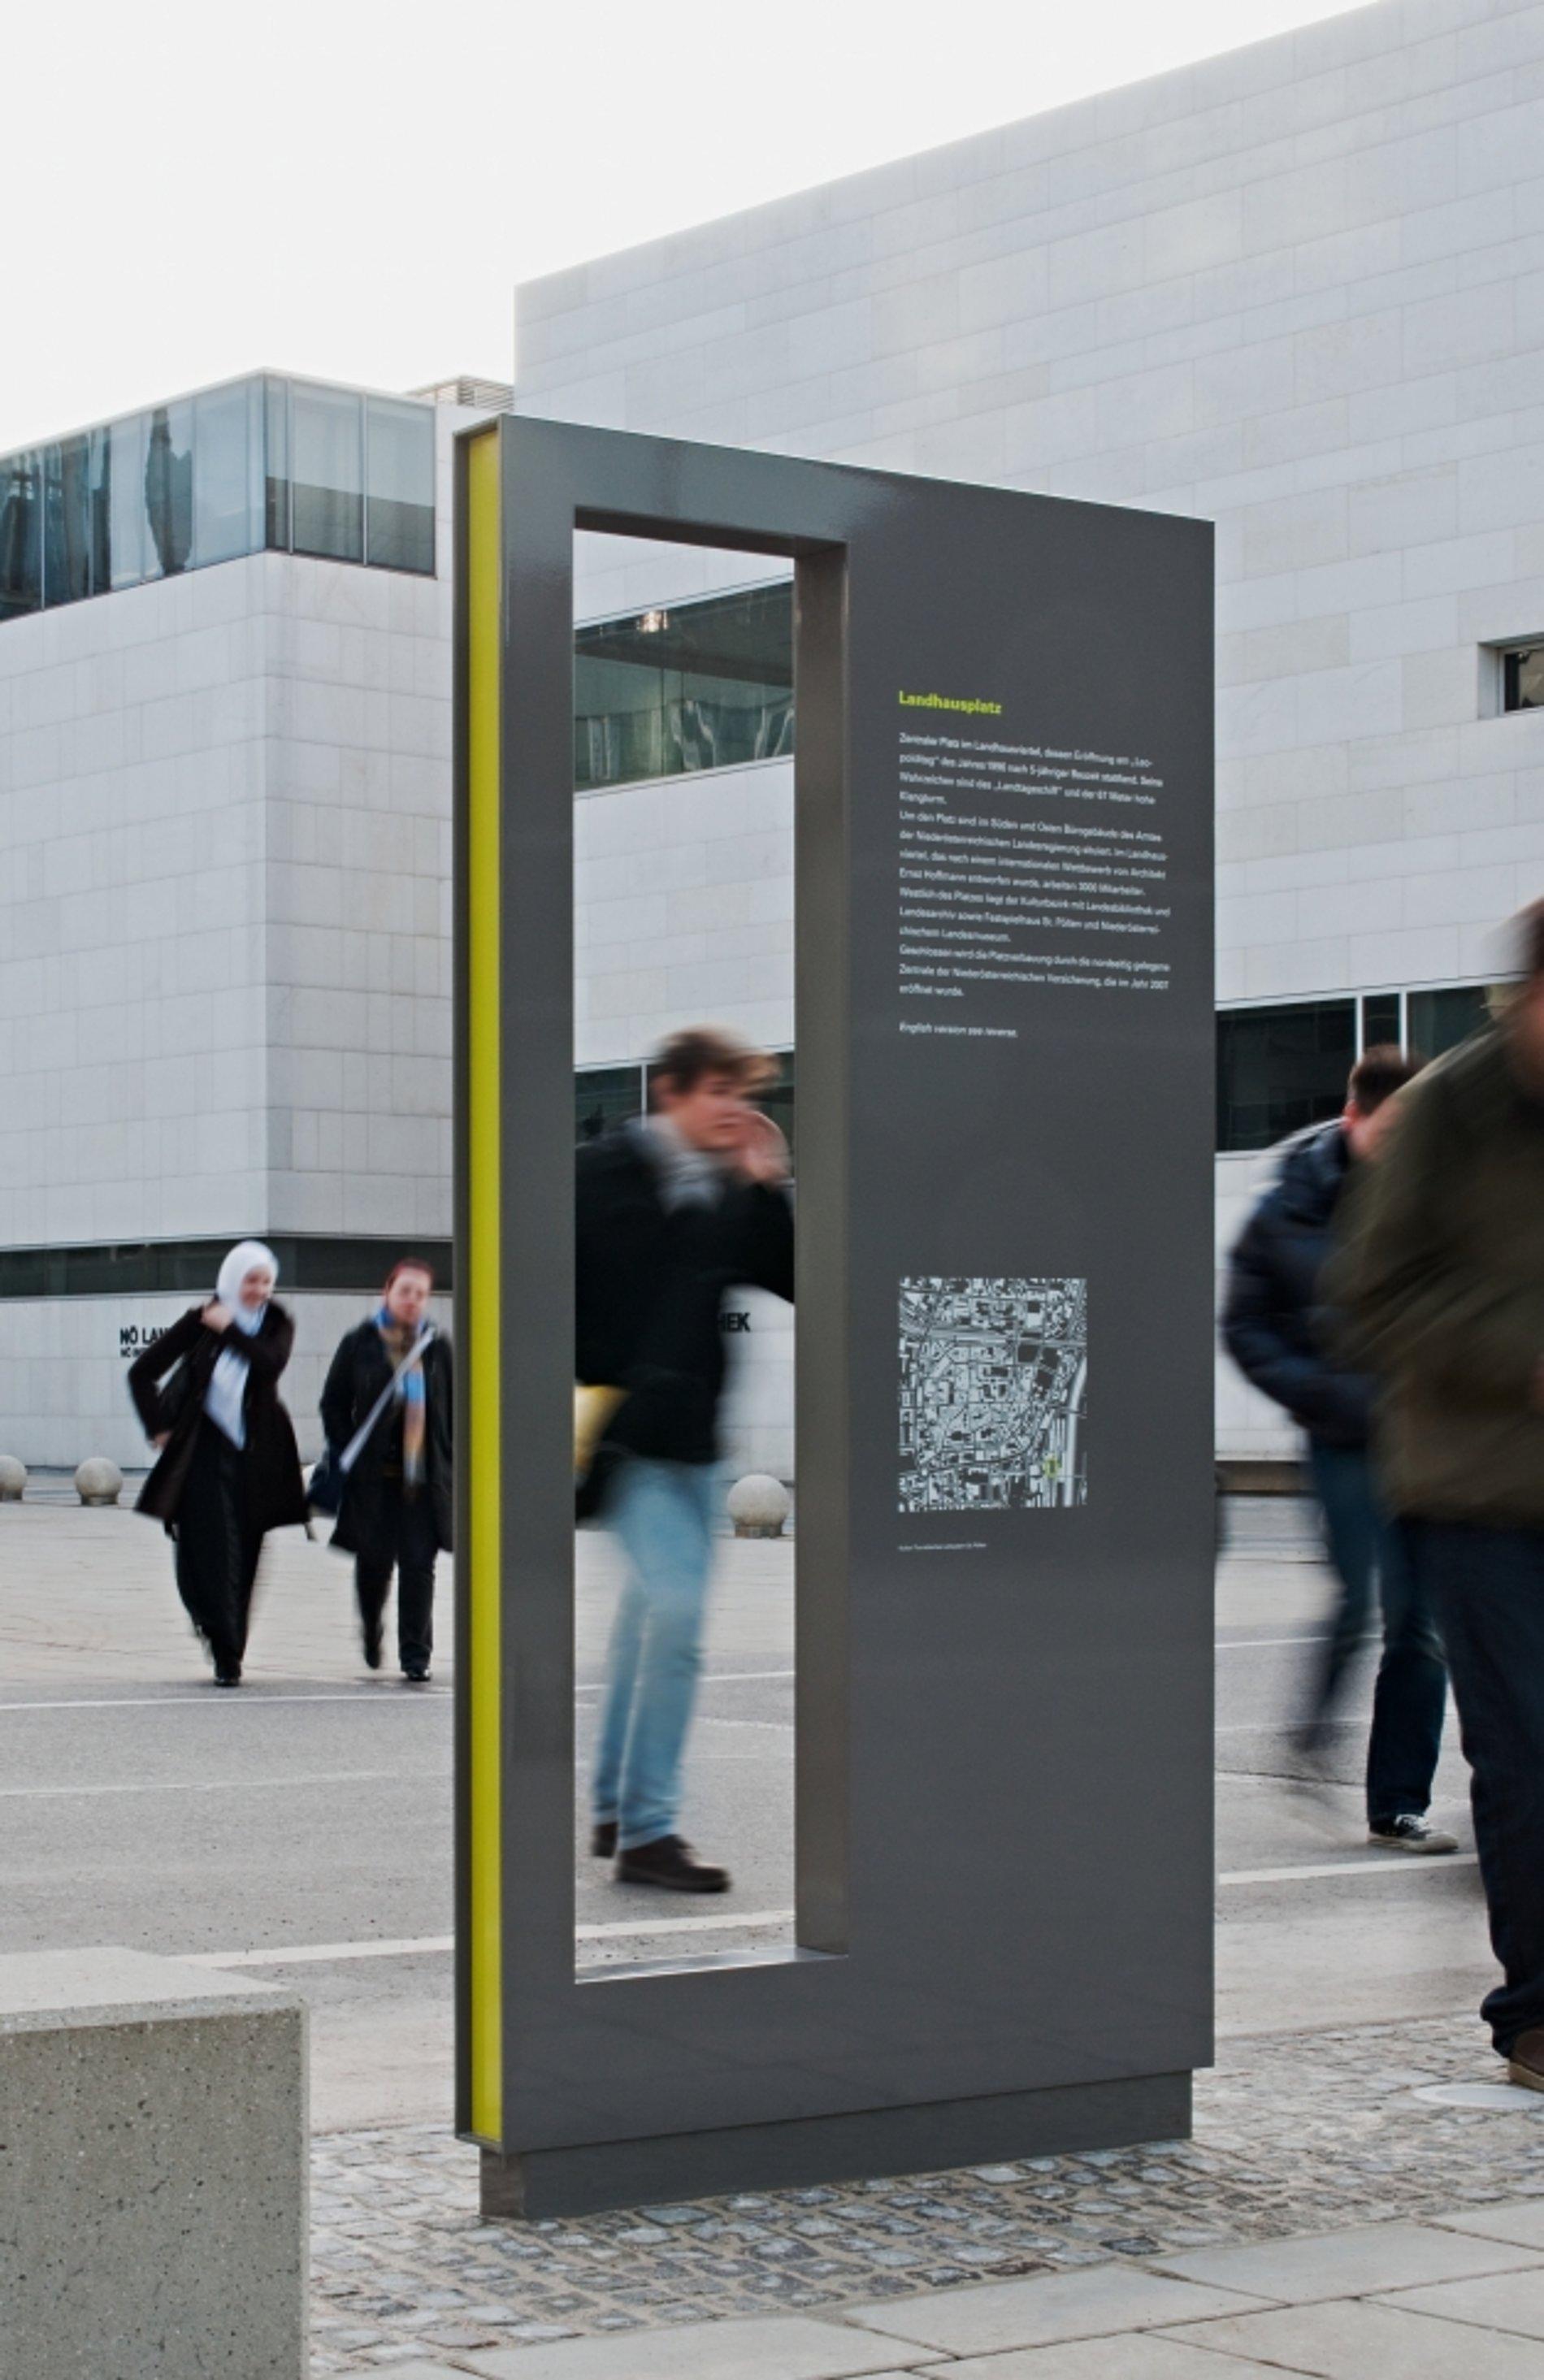 Kultur-Touristisches Leitsystem | Red Dot Design Award